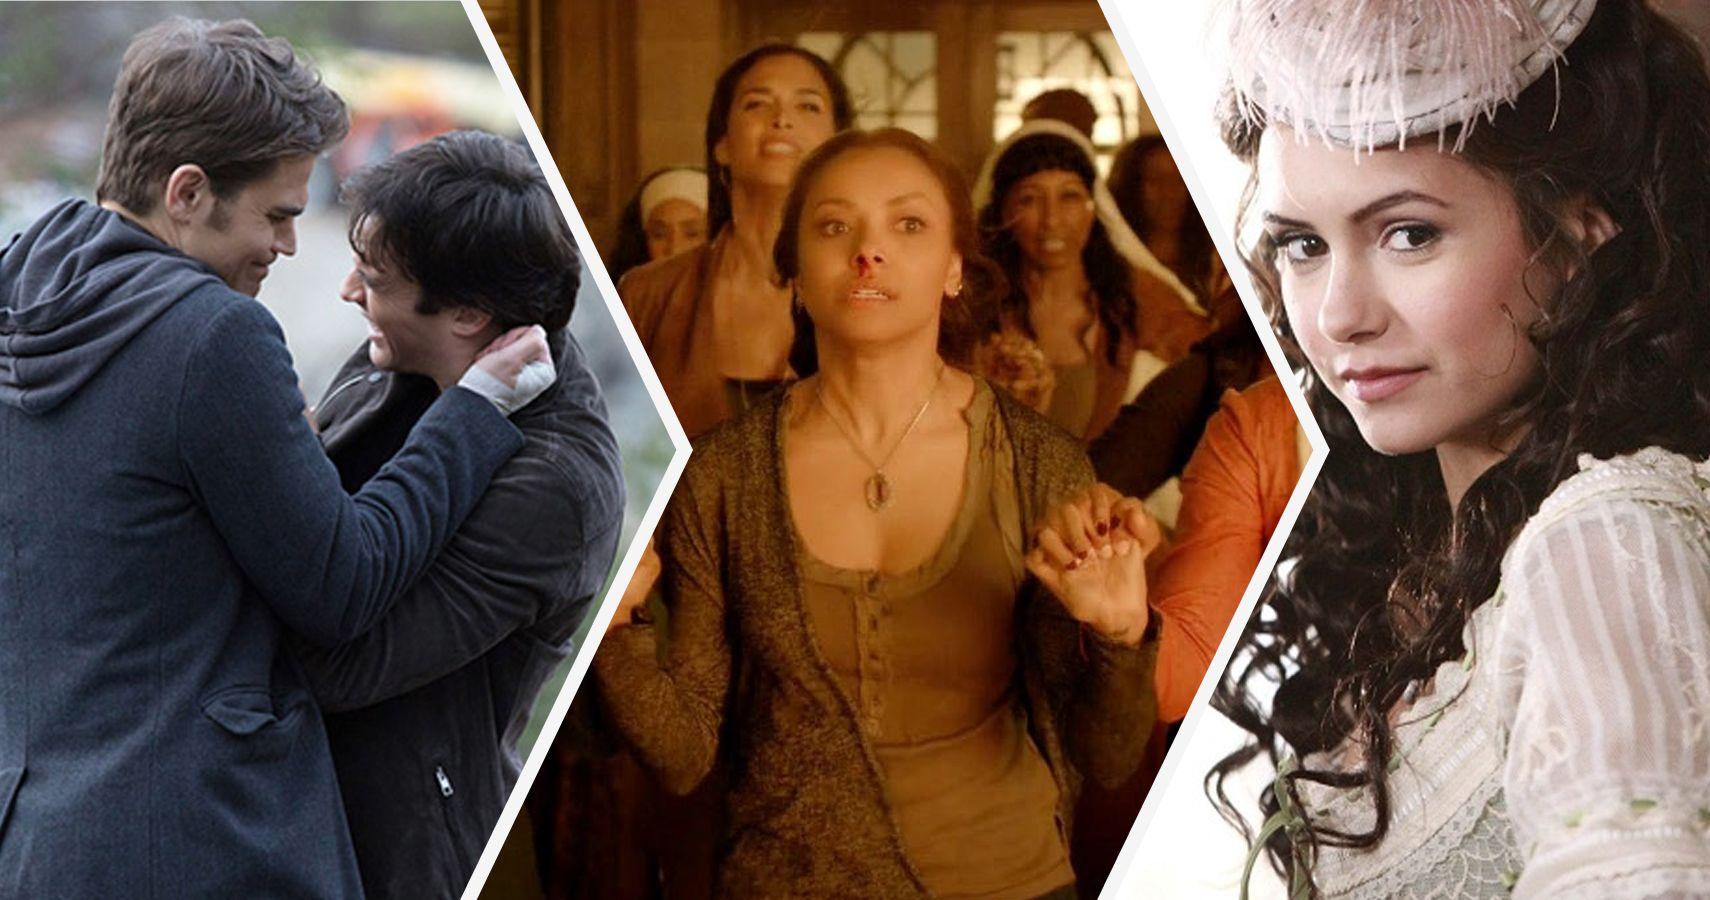 Things That Make No Sense About The Vampire Diaries | ScreenRant